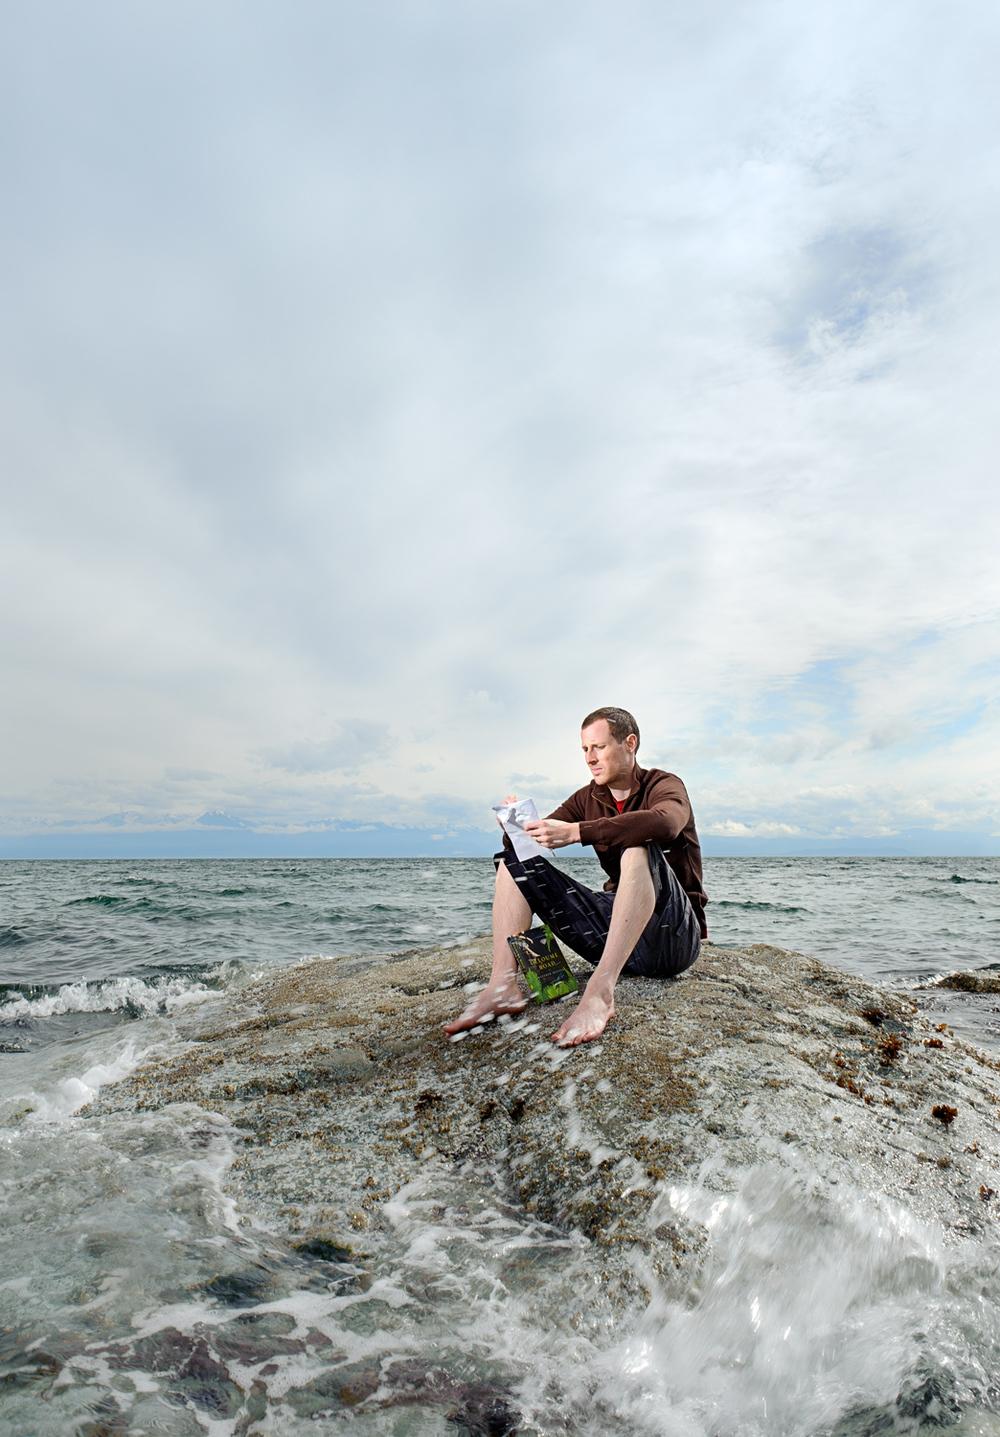 Matthew Hooton, Victoria, BC, Canada